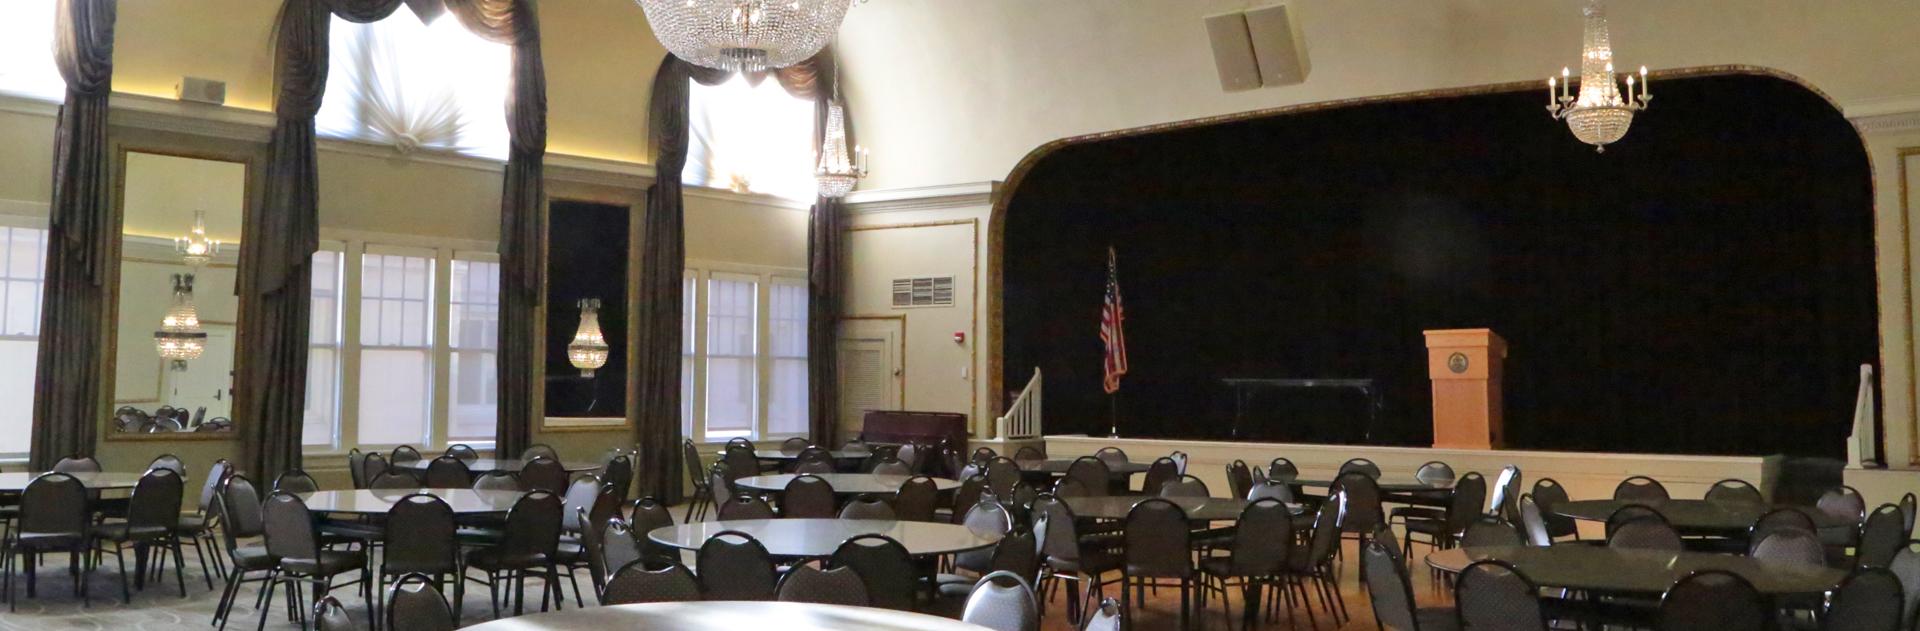 William Pitt Union Dining Room A